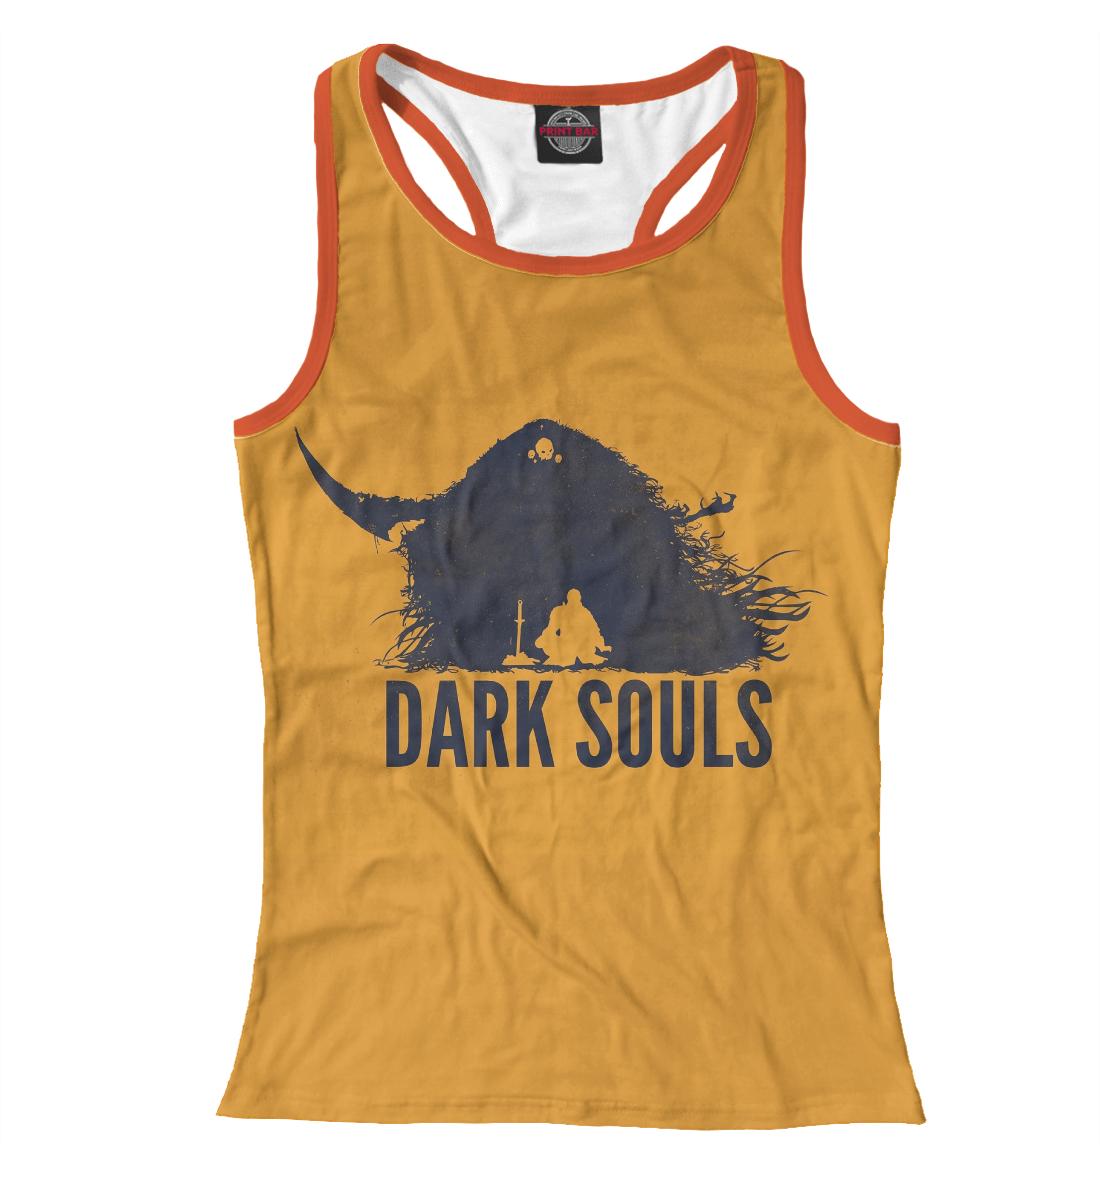 Купить Dark Souls, Printbar, Майки борцовки, DKS-220216-mayb-1